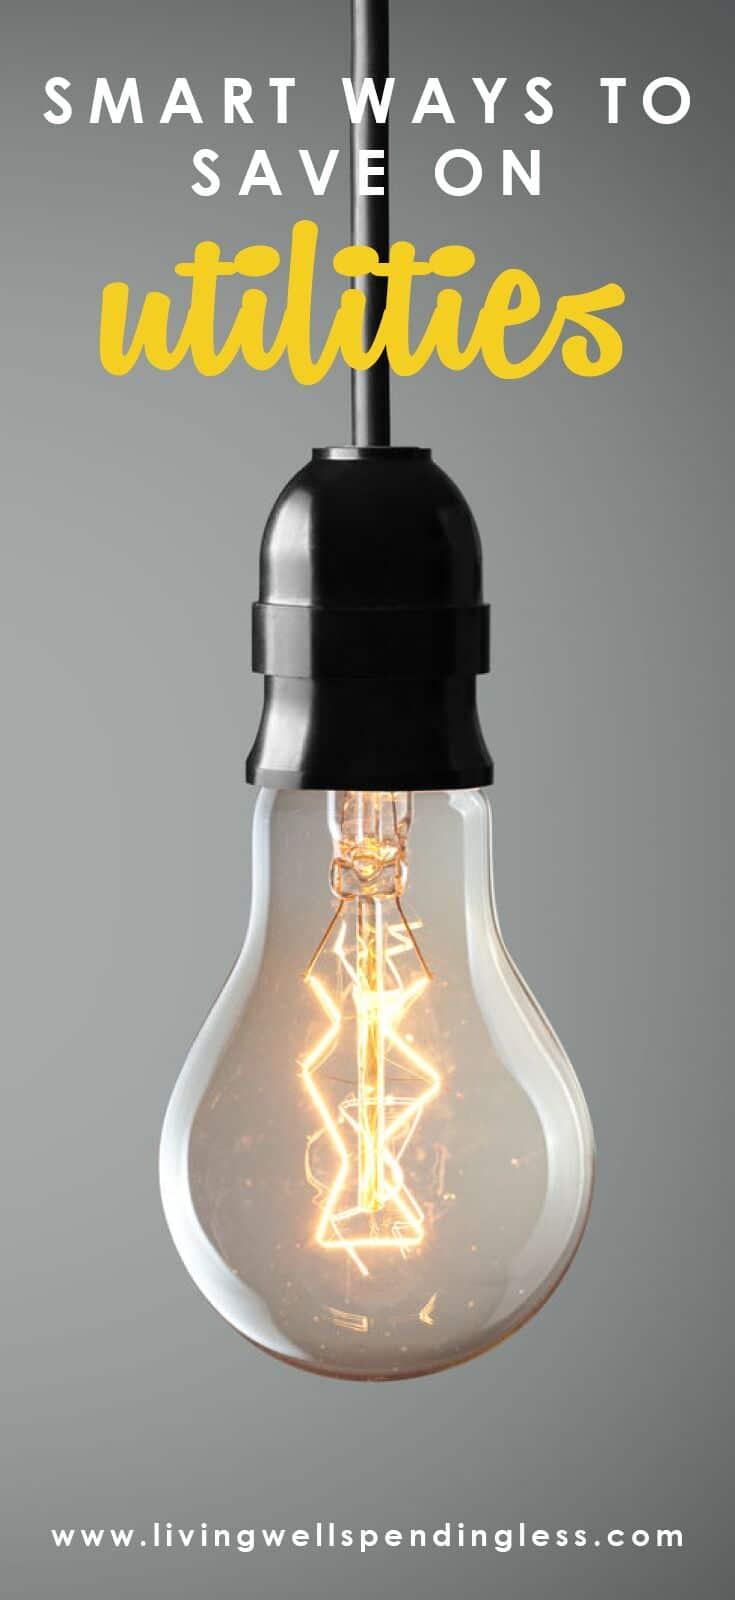 Smart Ways to Save on Utilities | Money Saving Tips | Budget Tips | Money Saving Hacks | Cut Down on Bills | Lower Your Bills | Reduce Bills | Energy Saver Hacks | Lower Electricity Bills